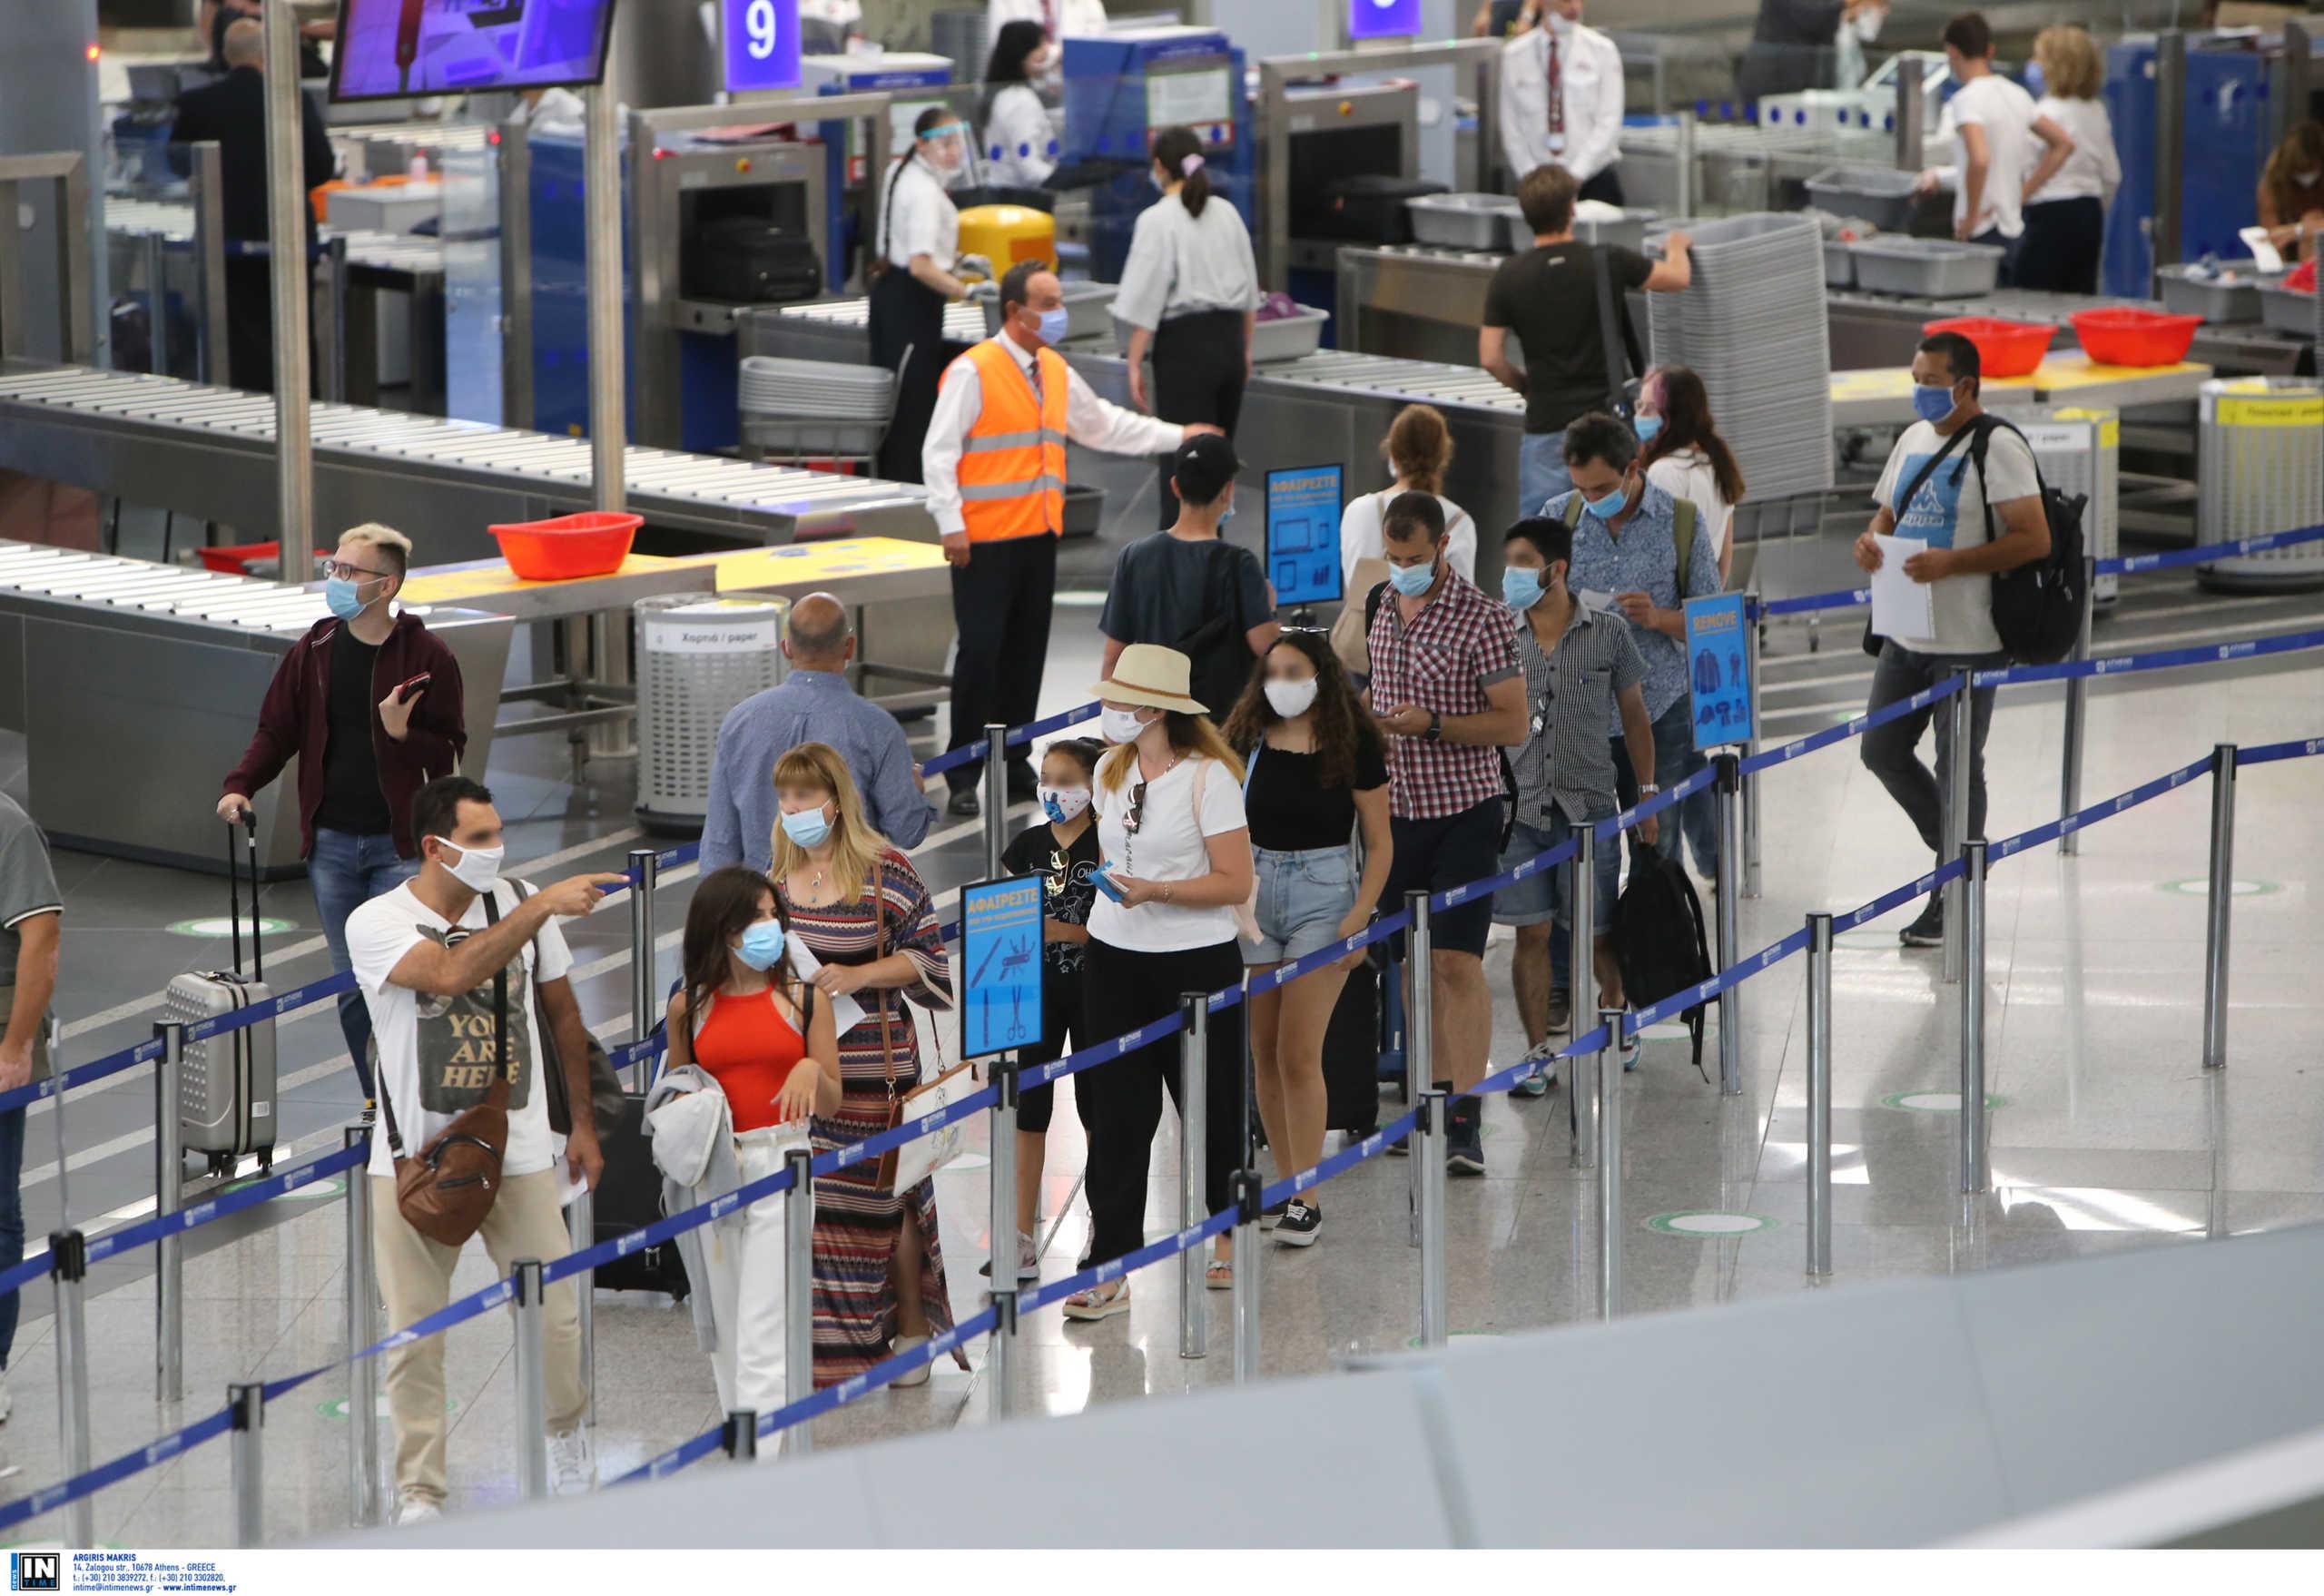 NOTAM: Τροποποίηση απαγόρευσης εισόδου στη χώρα μη Ευρωπαίων Πολιτών – Ποιοι εξαιρούνται